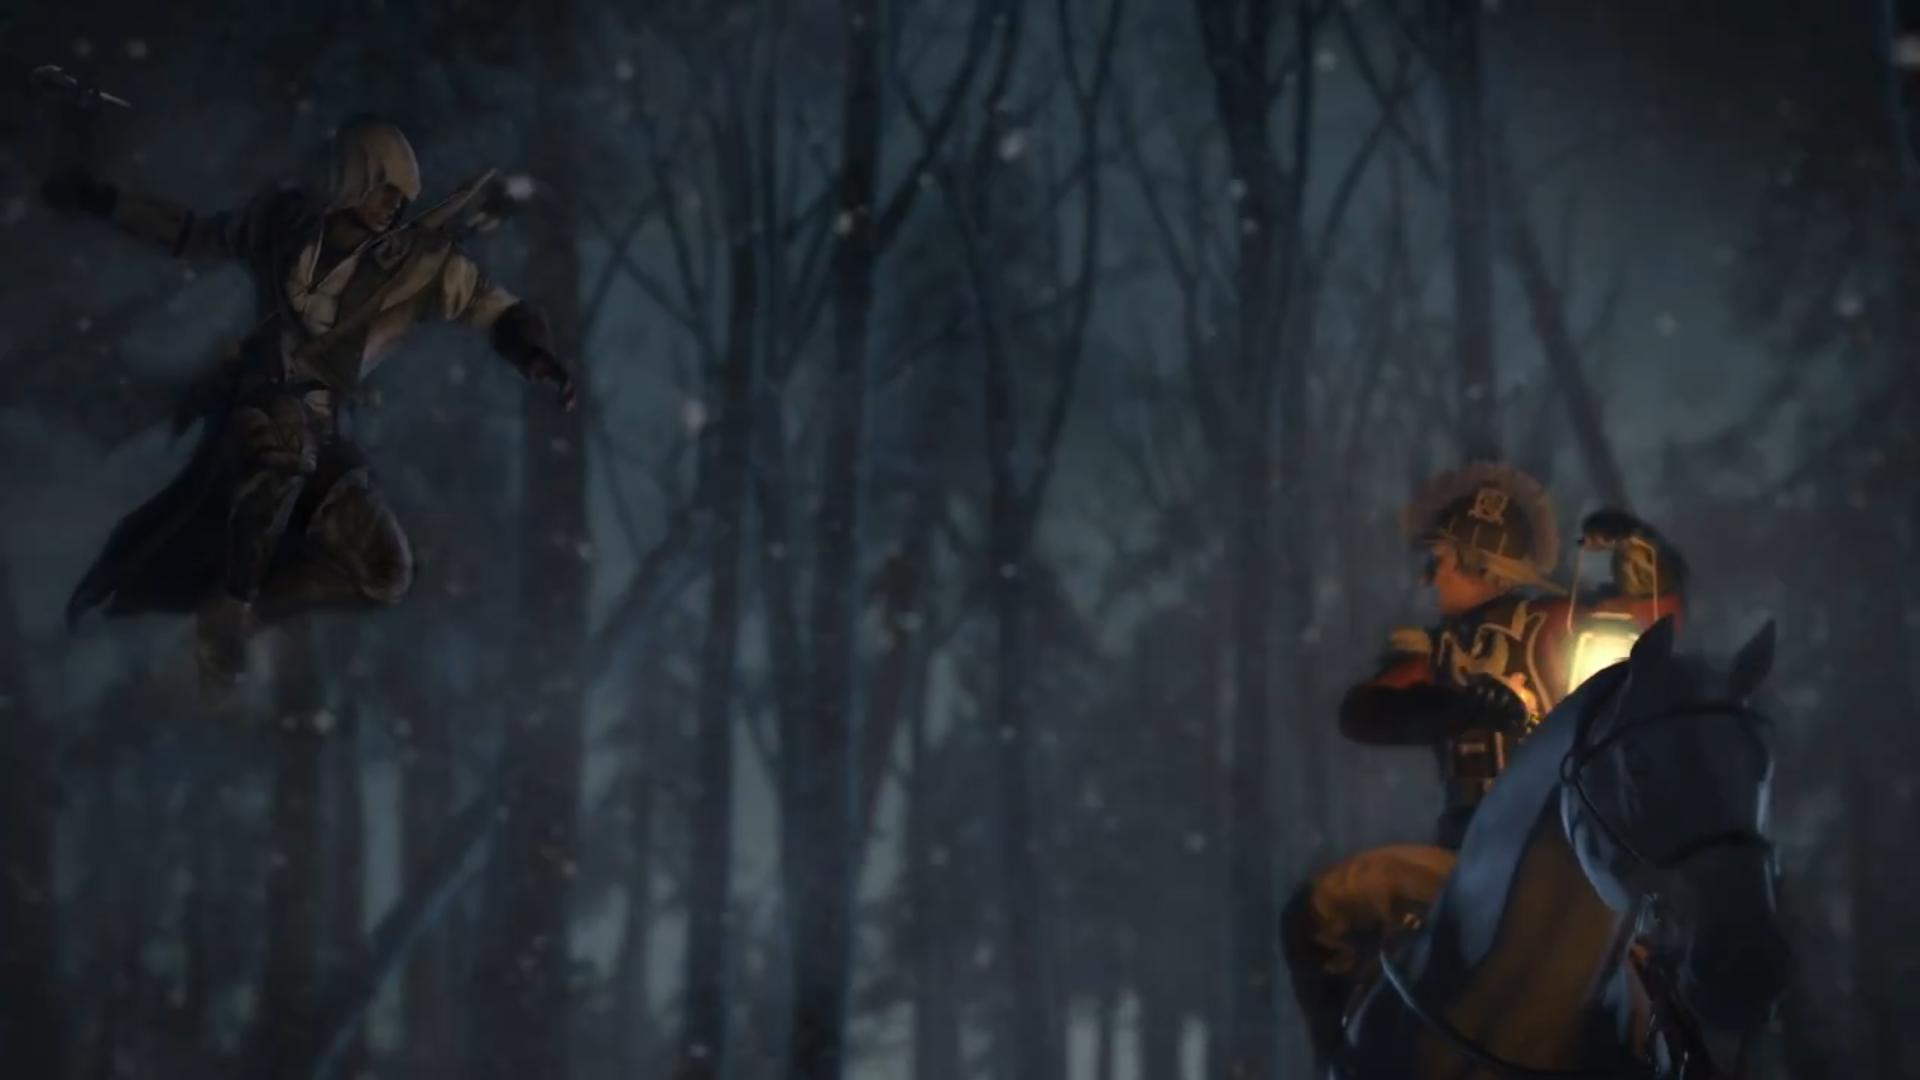 Assassin's Creed 3 - Rozbor prvního traileru 61680